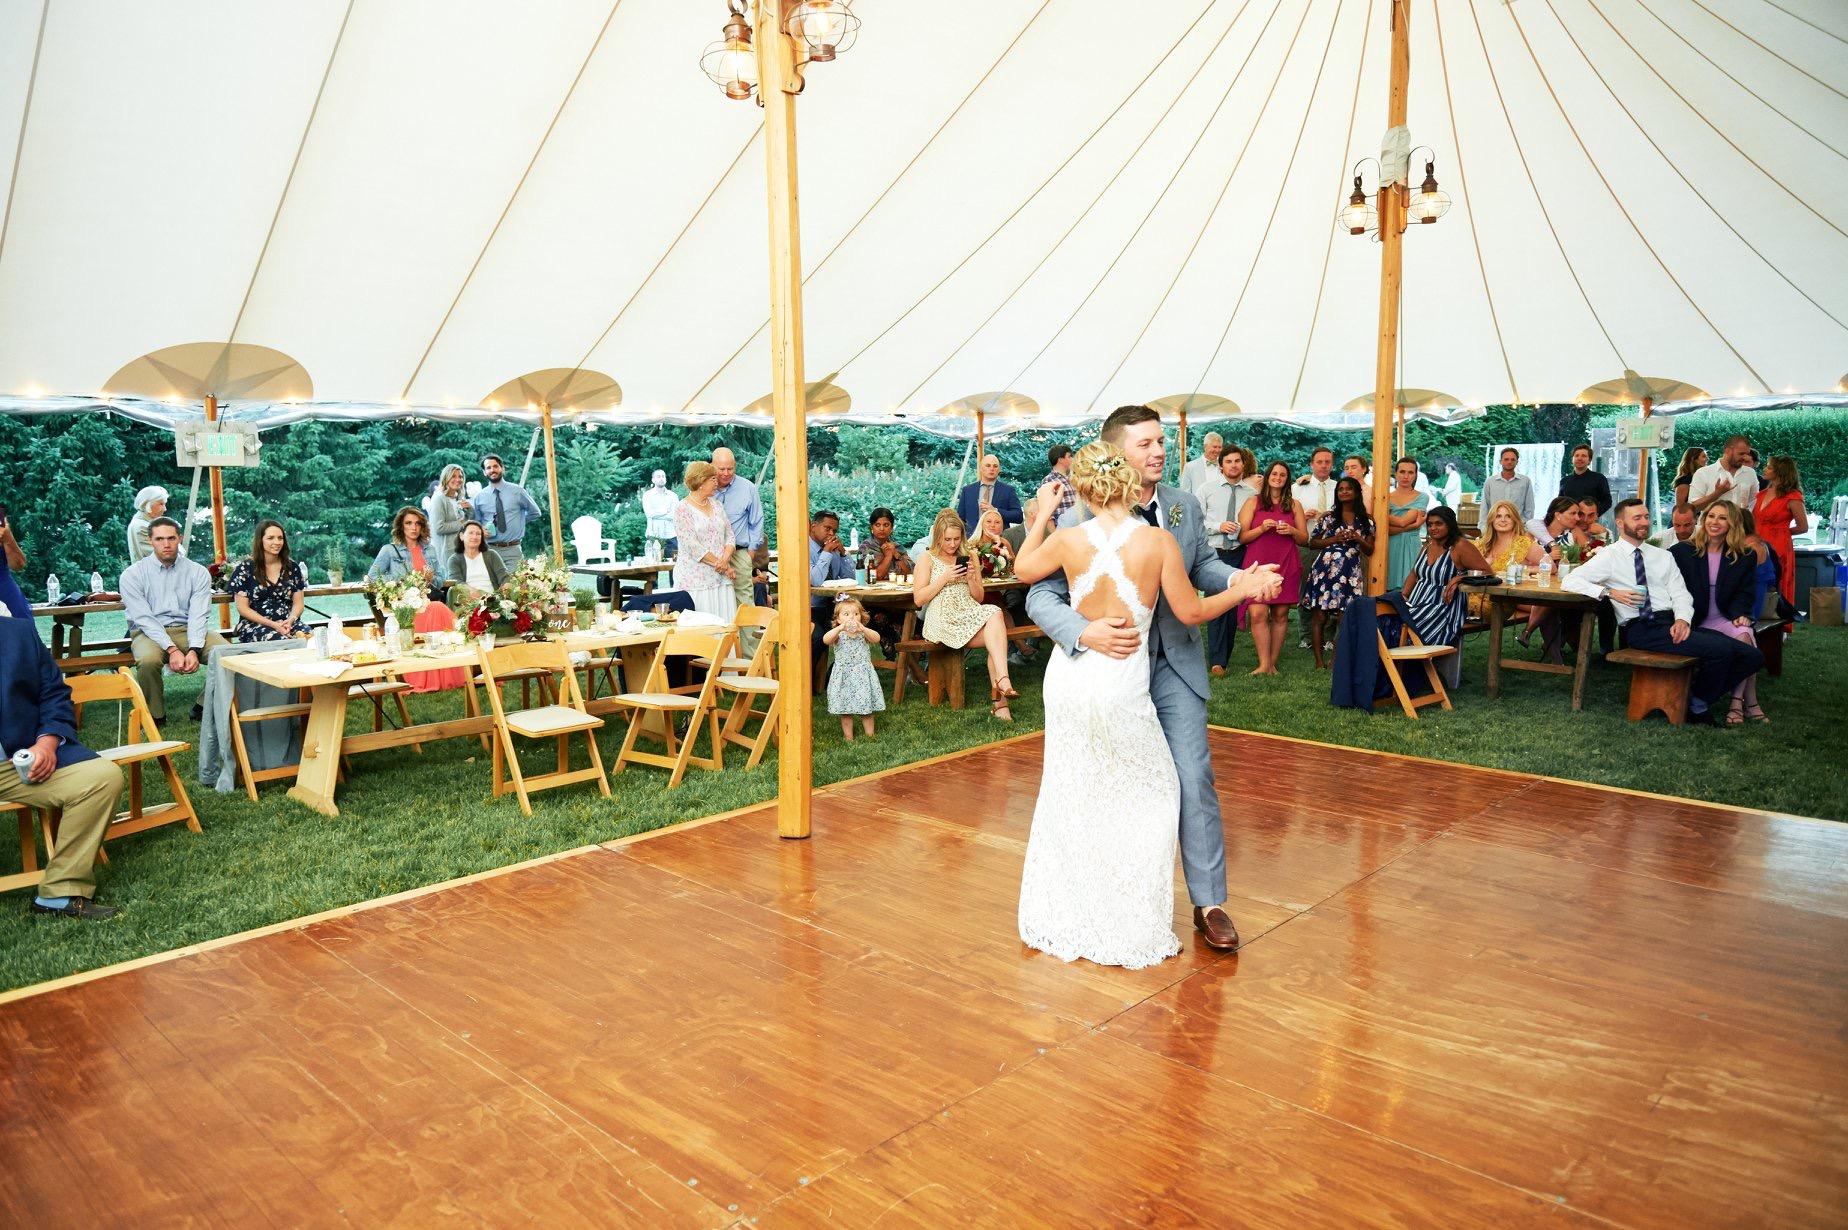 Ananda & Jason's Farmers Daughter tented wedding in Rhode Island - Pearl Weddings & Events